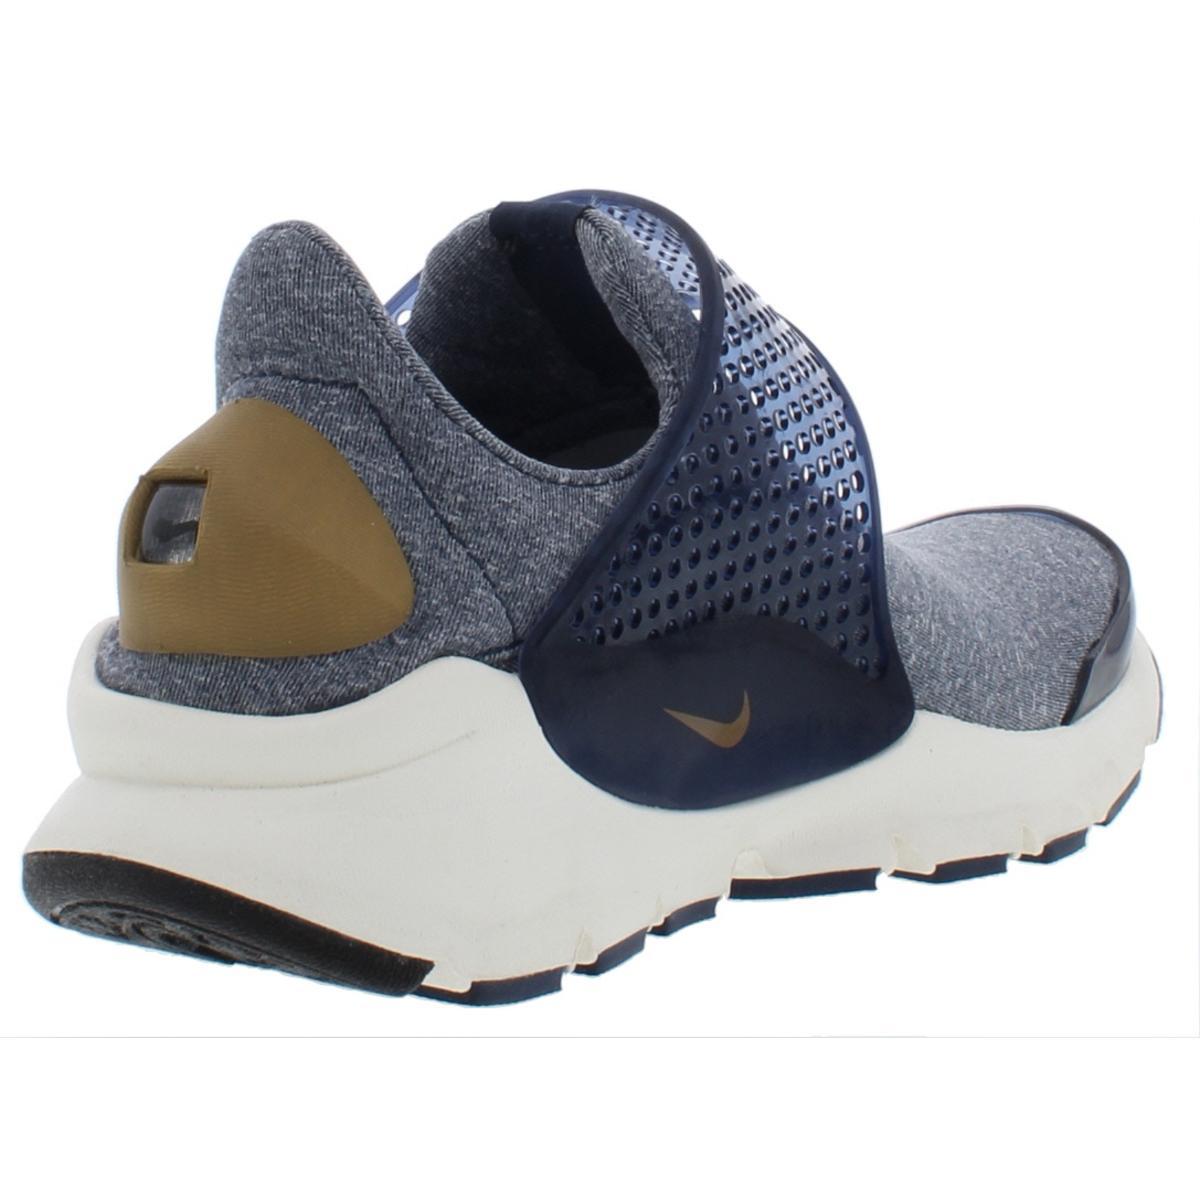 Nike-Womens-Sock-Dart-SE-Running-Low-Top-Athletic-Shoes-Sneakers-BHFO-3394 thumbnail 6